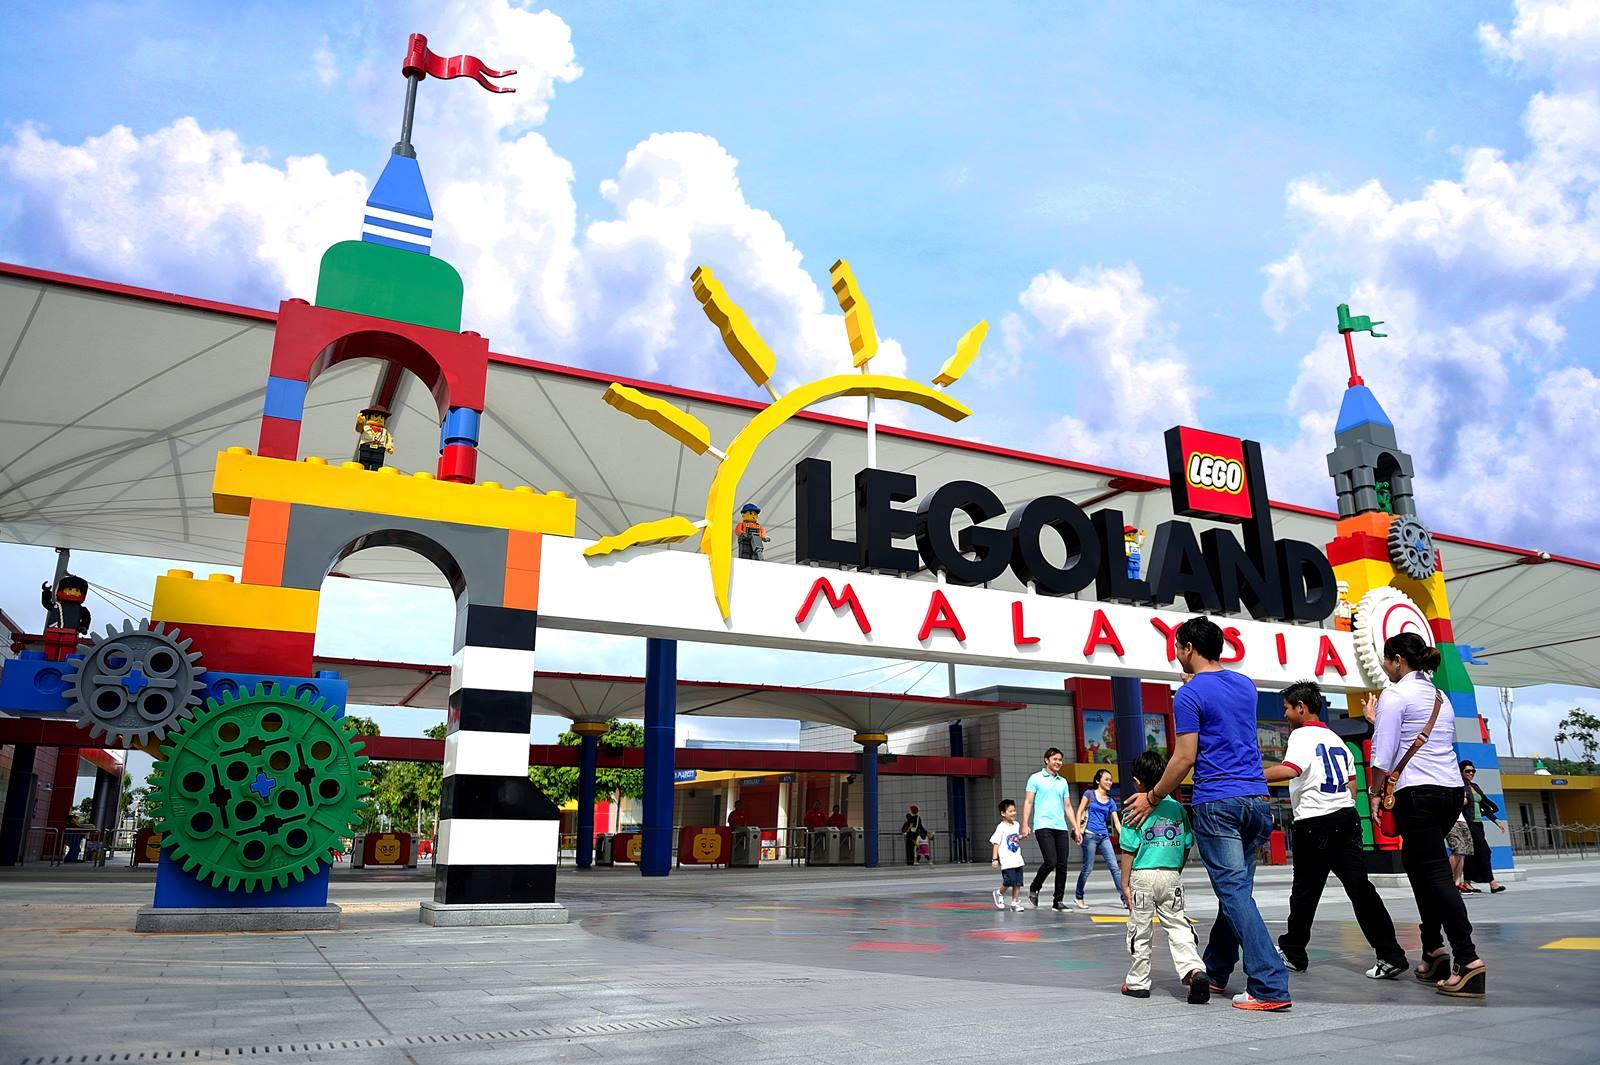 Hotels near Legoland Malaysia, Johor Bahru - BEST HOTEL